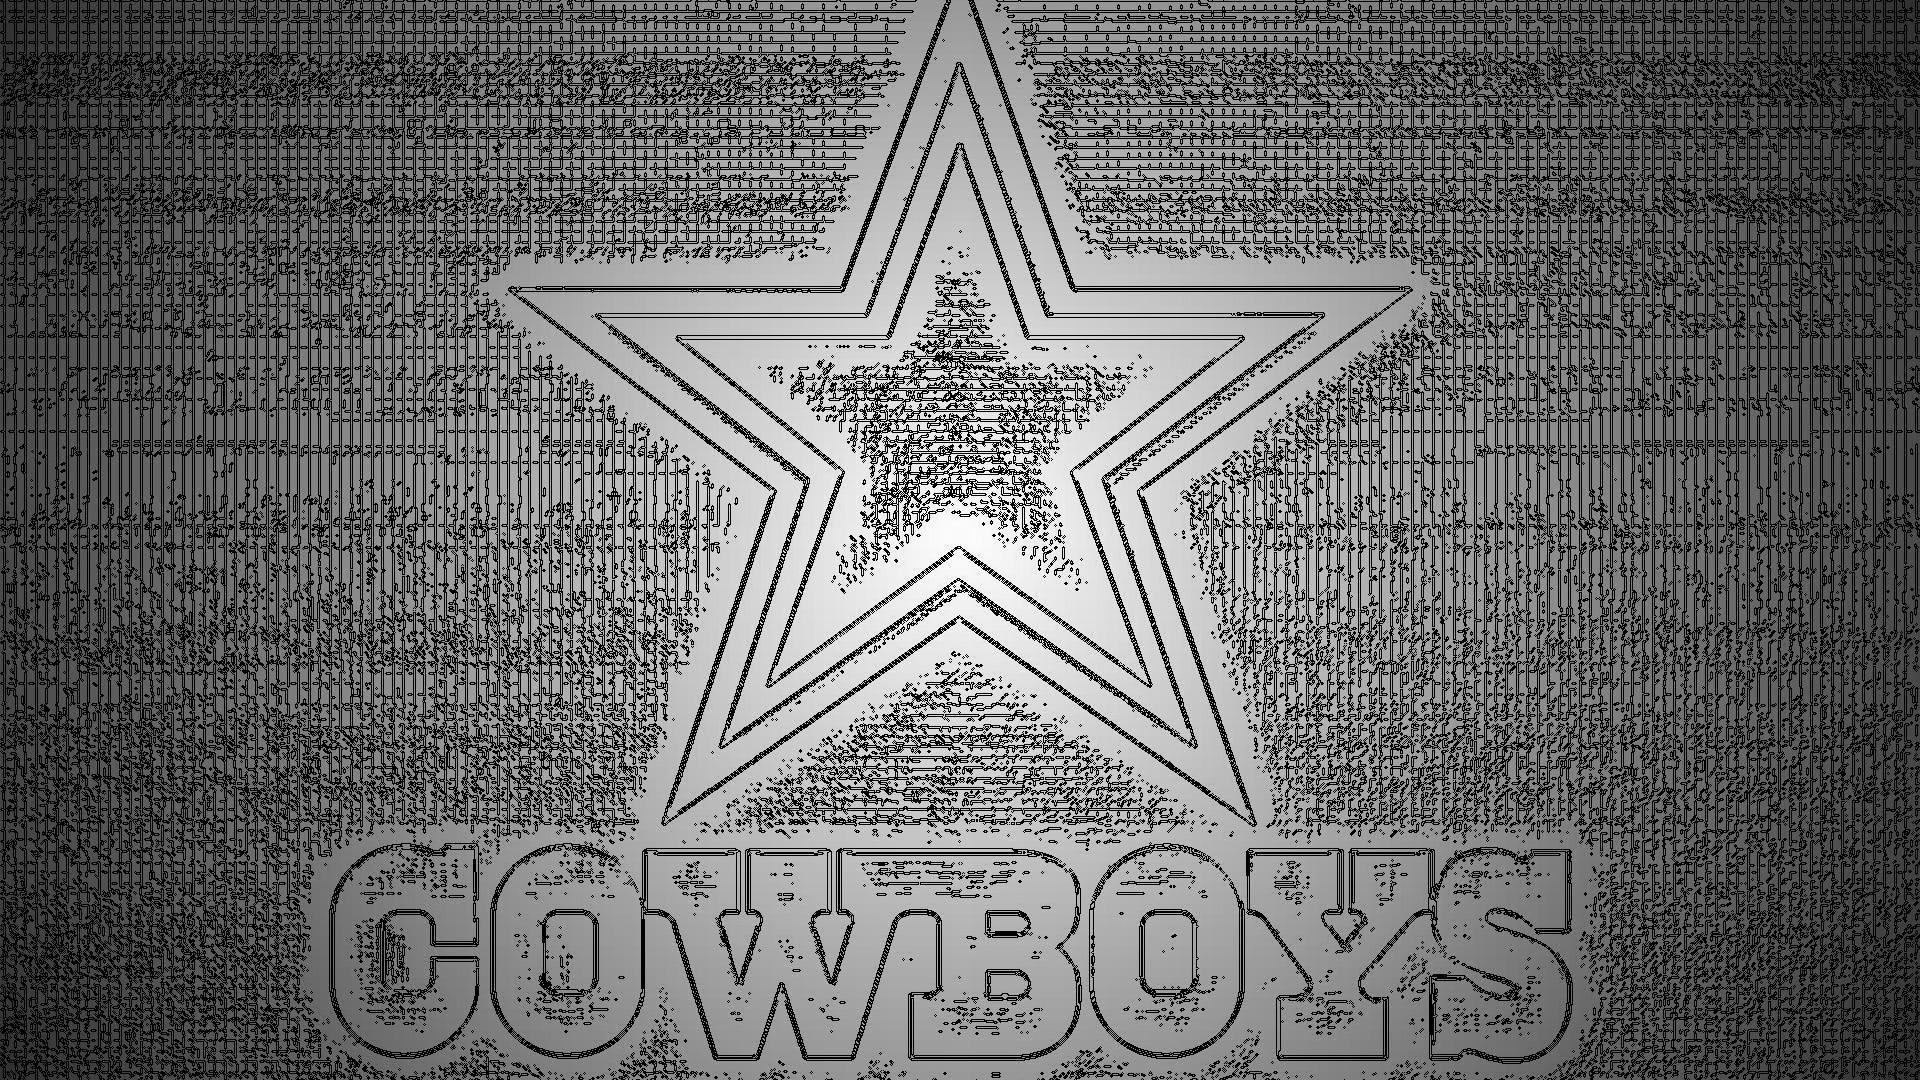 Dallas Cowboys Wallpapers HD (66+ images)